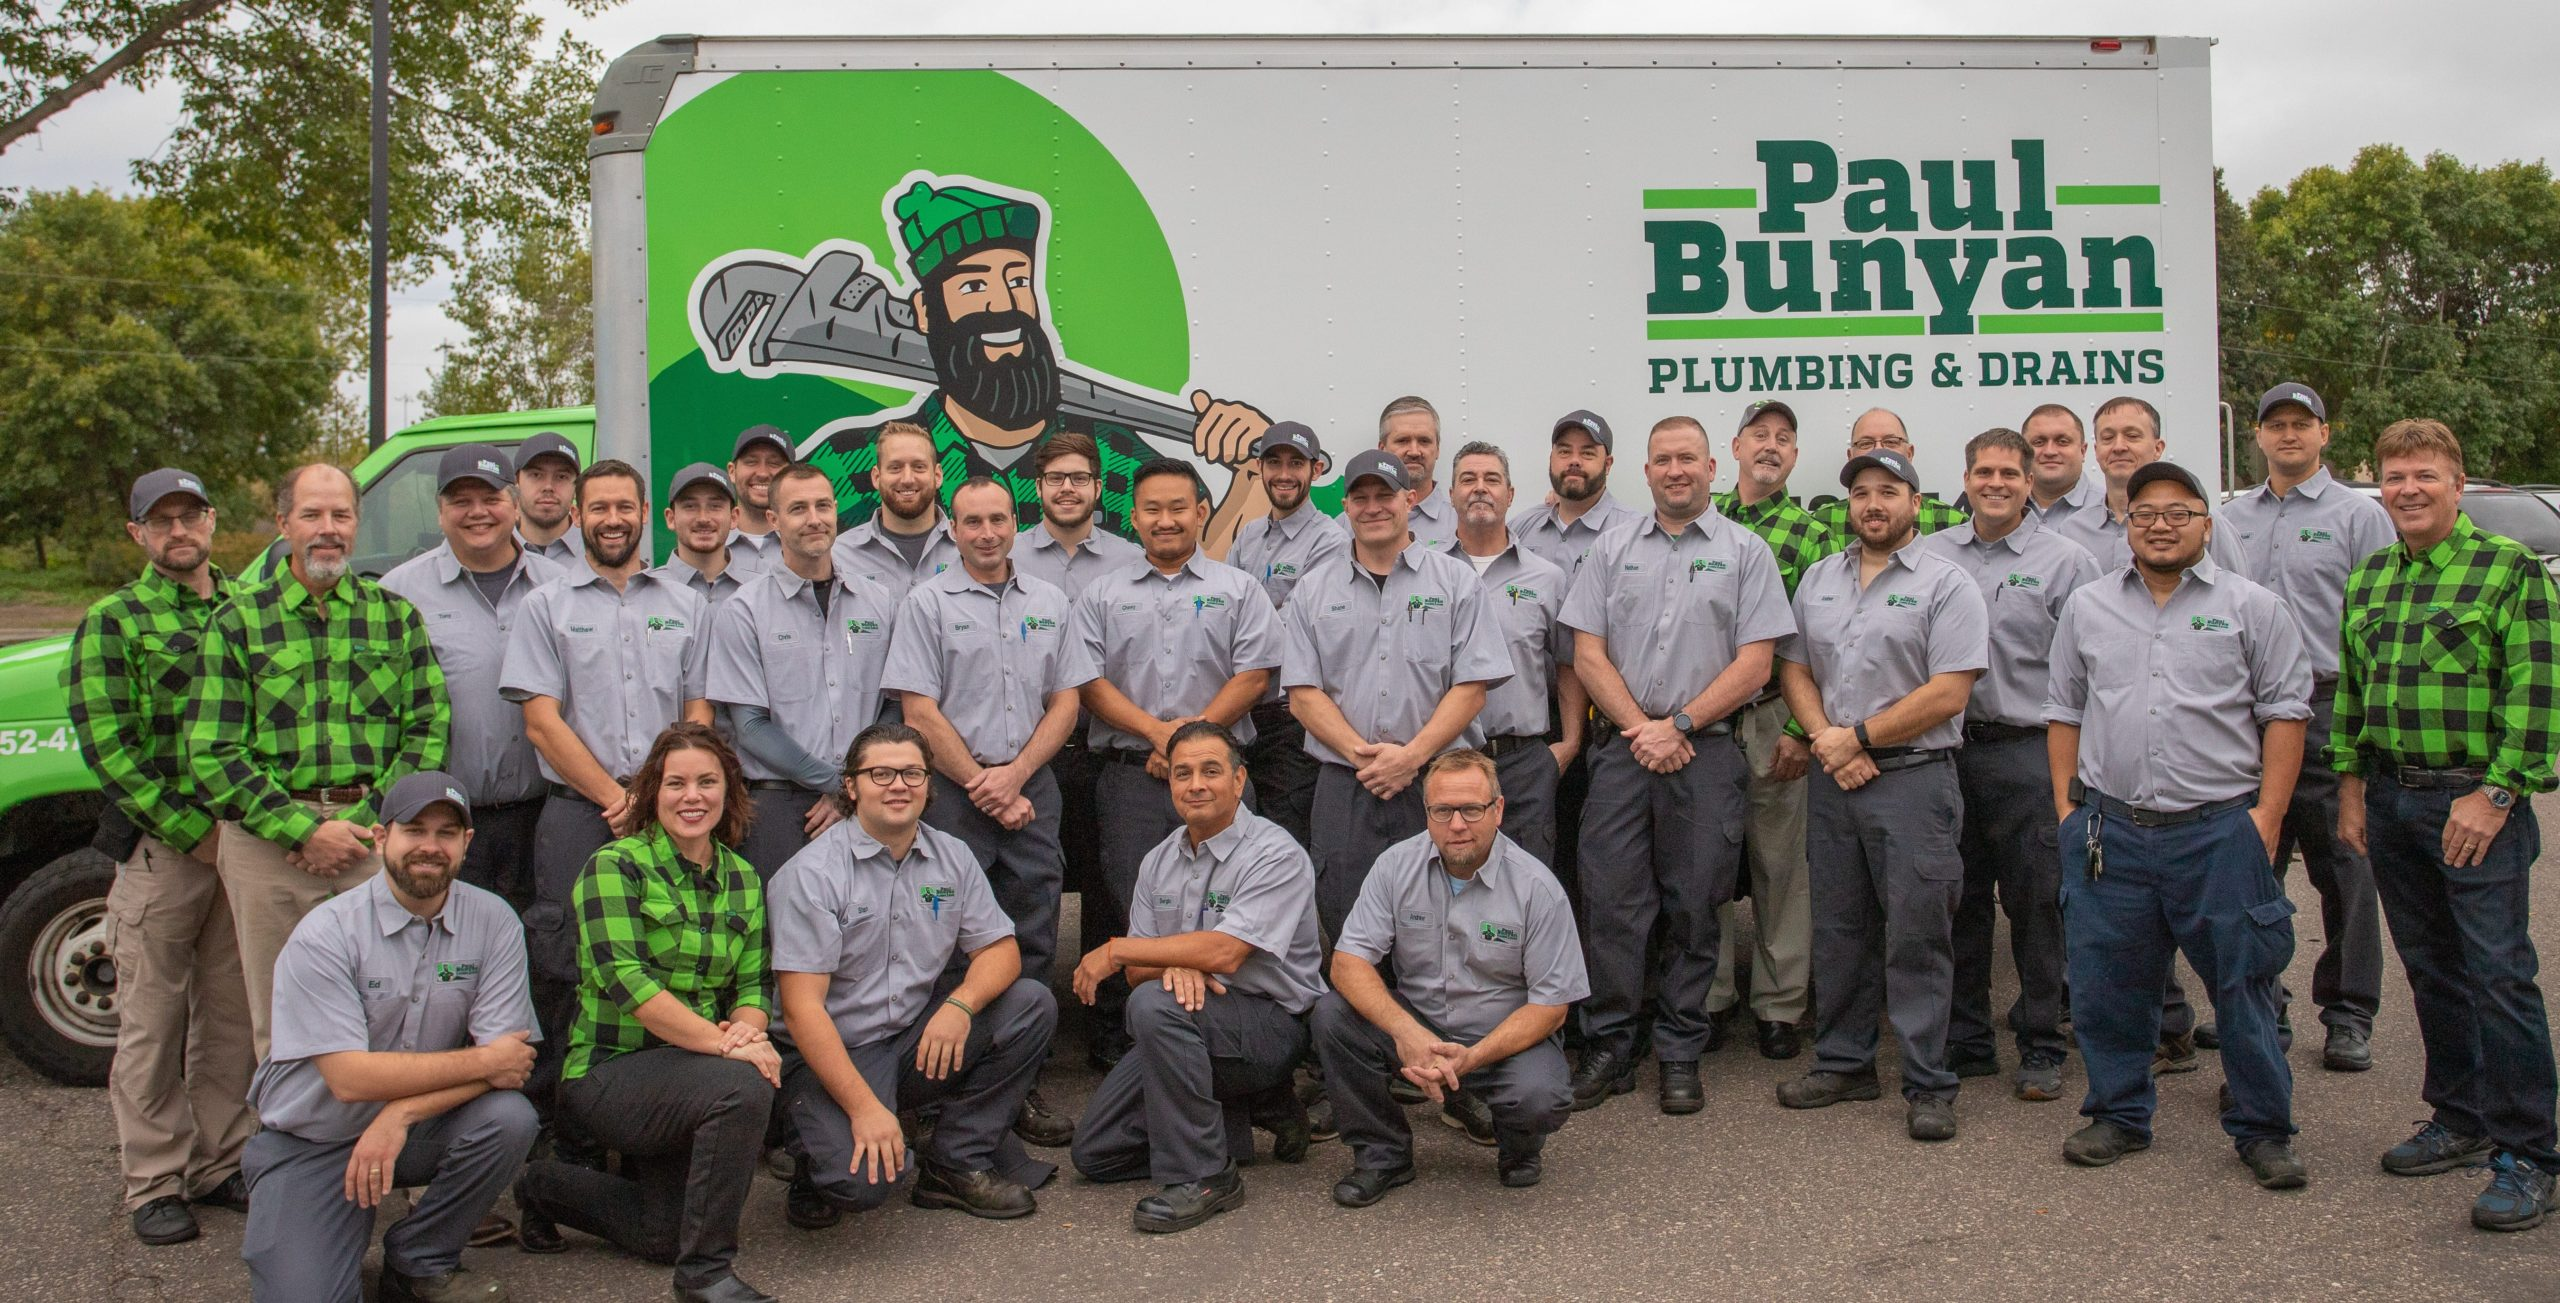 Paul Bunyan Plumbing And Drains- Serving Brooklyn Park, MN